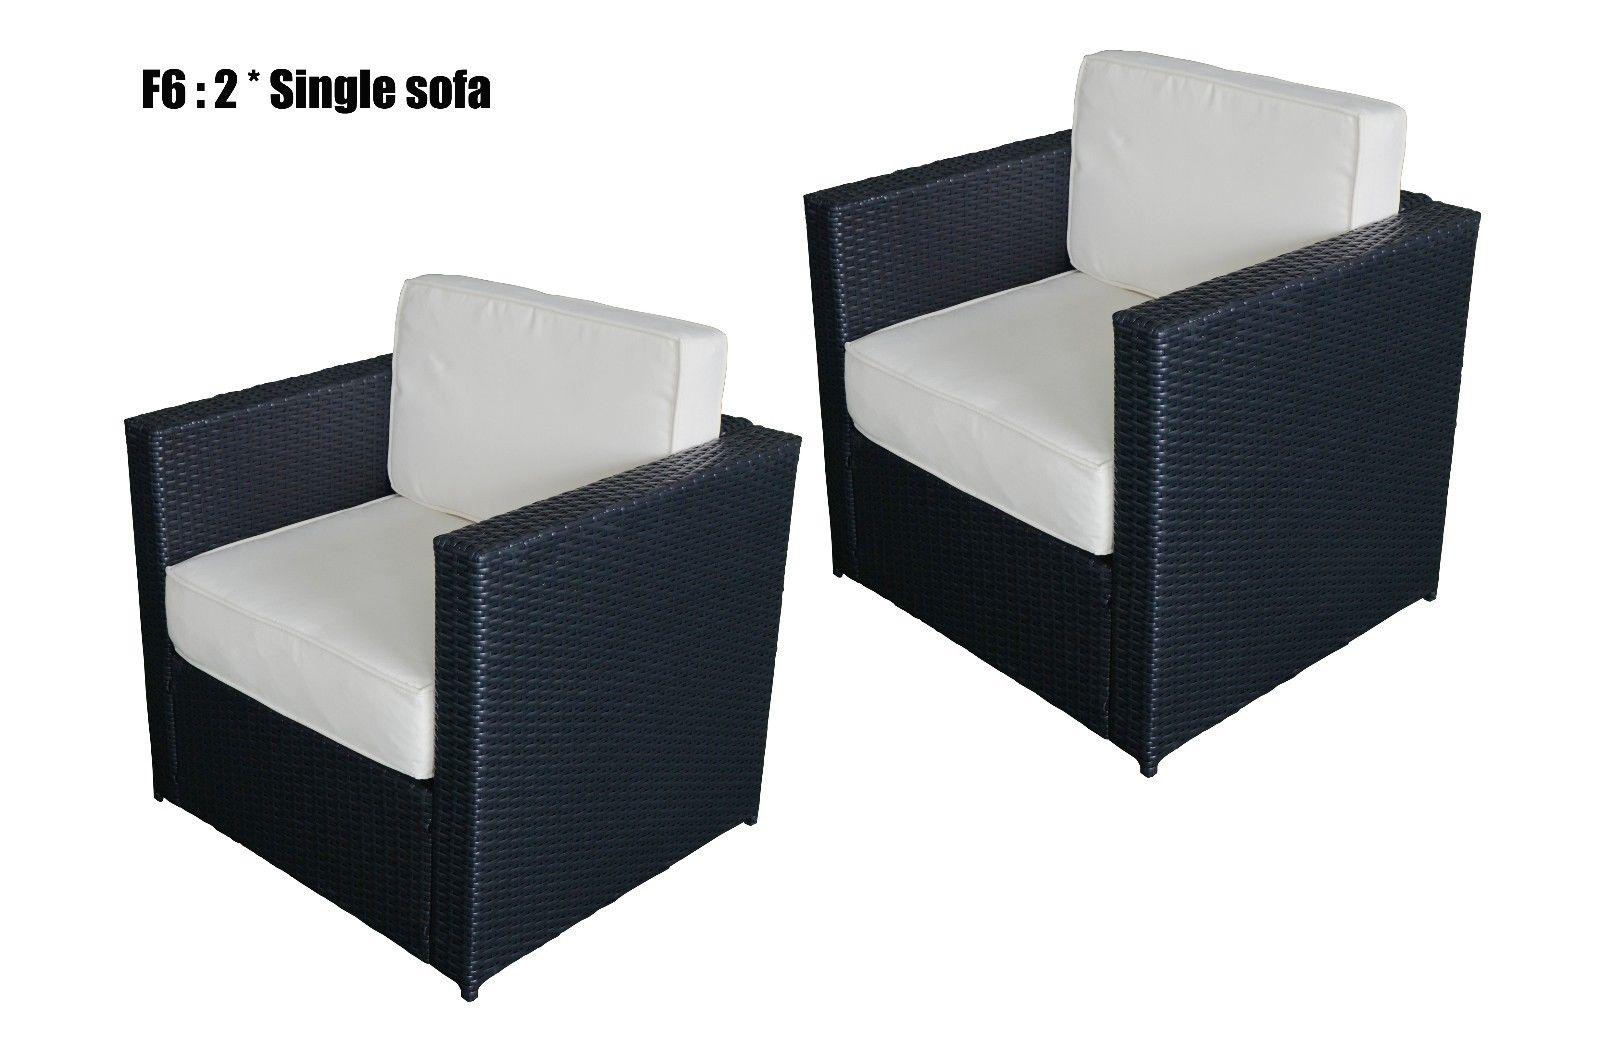 Mcombo Diy Cozy Outdoor Garden Patio Rattan Wicker Furniture